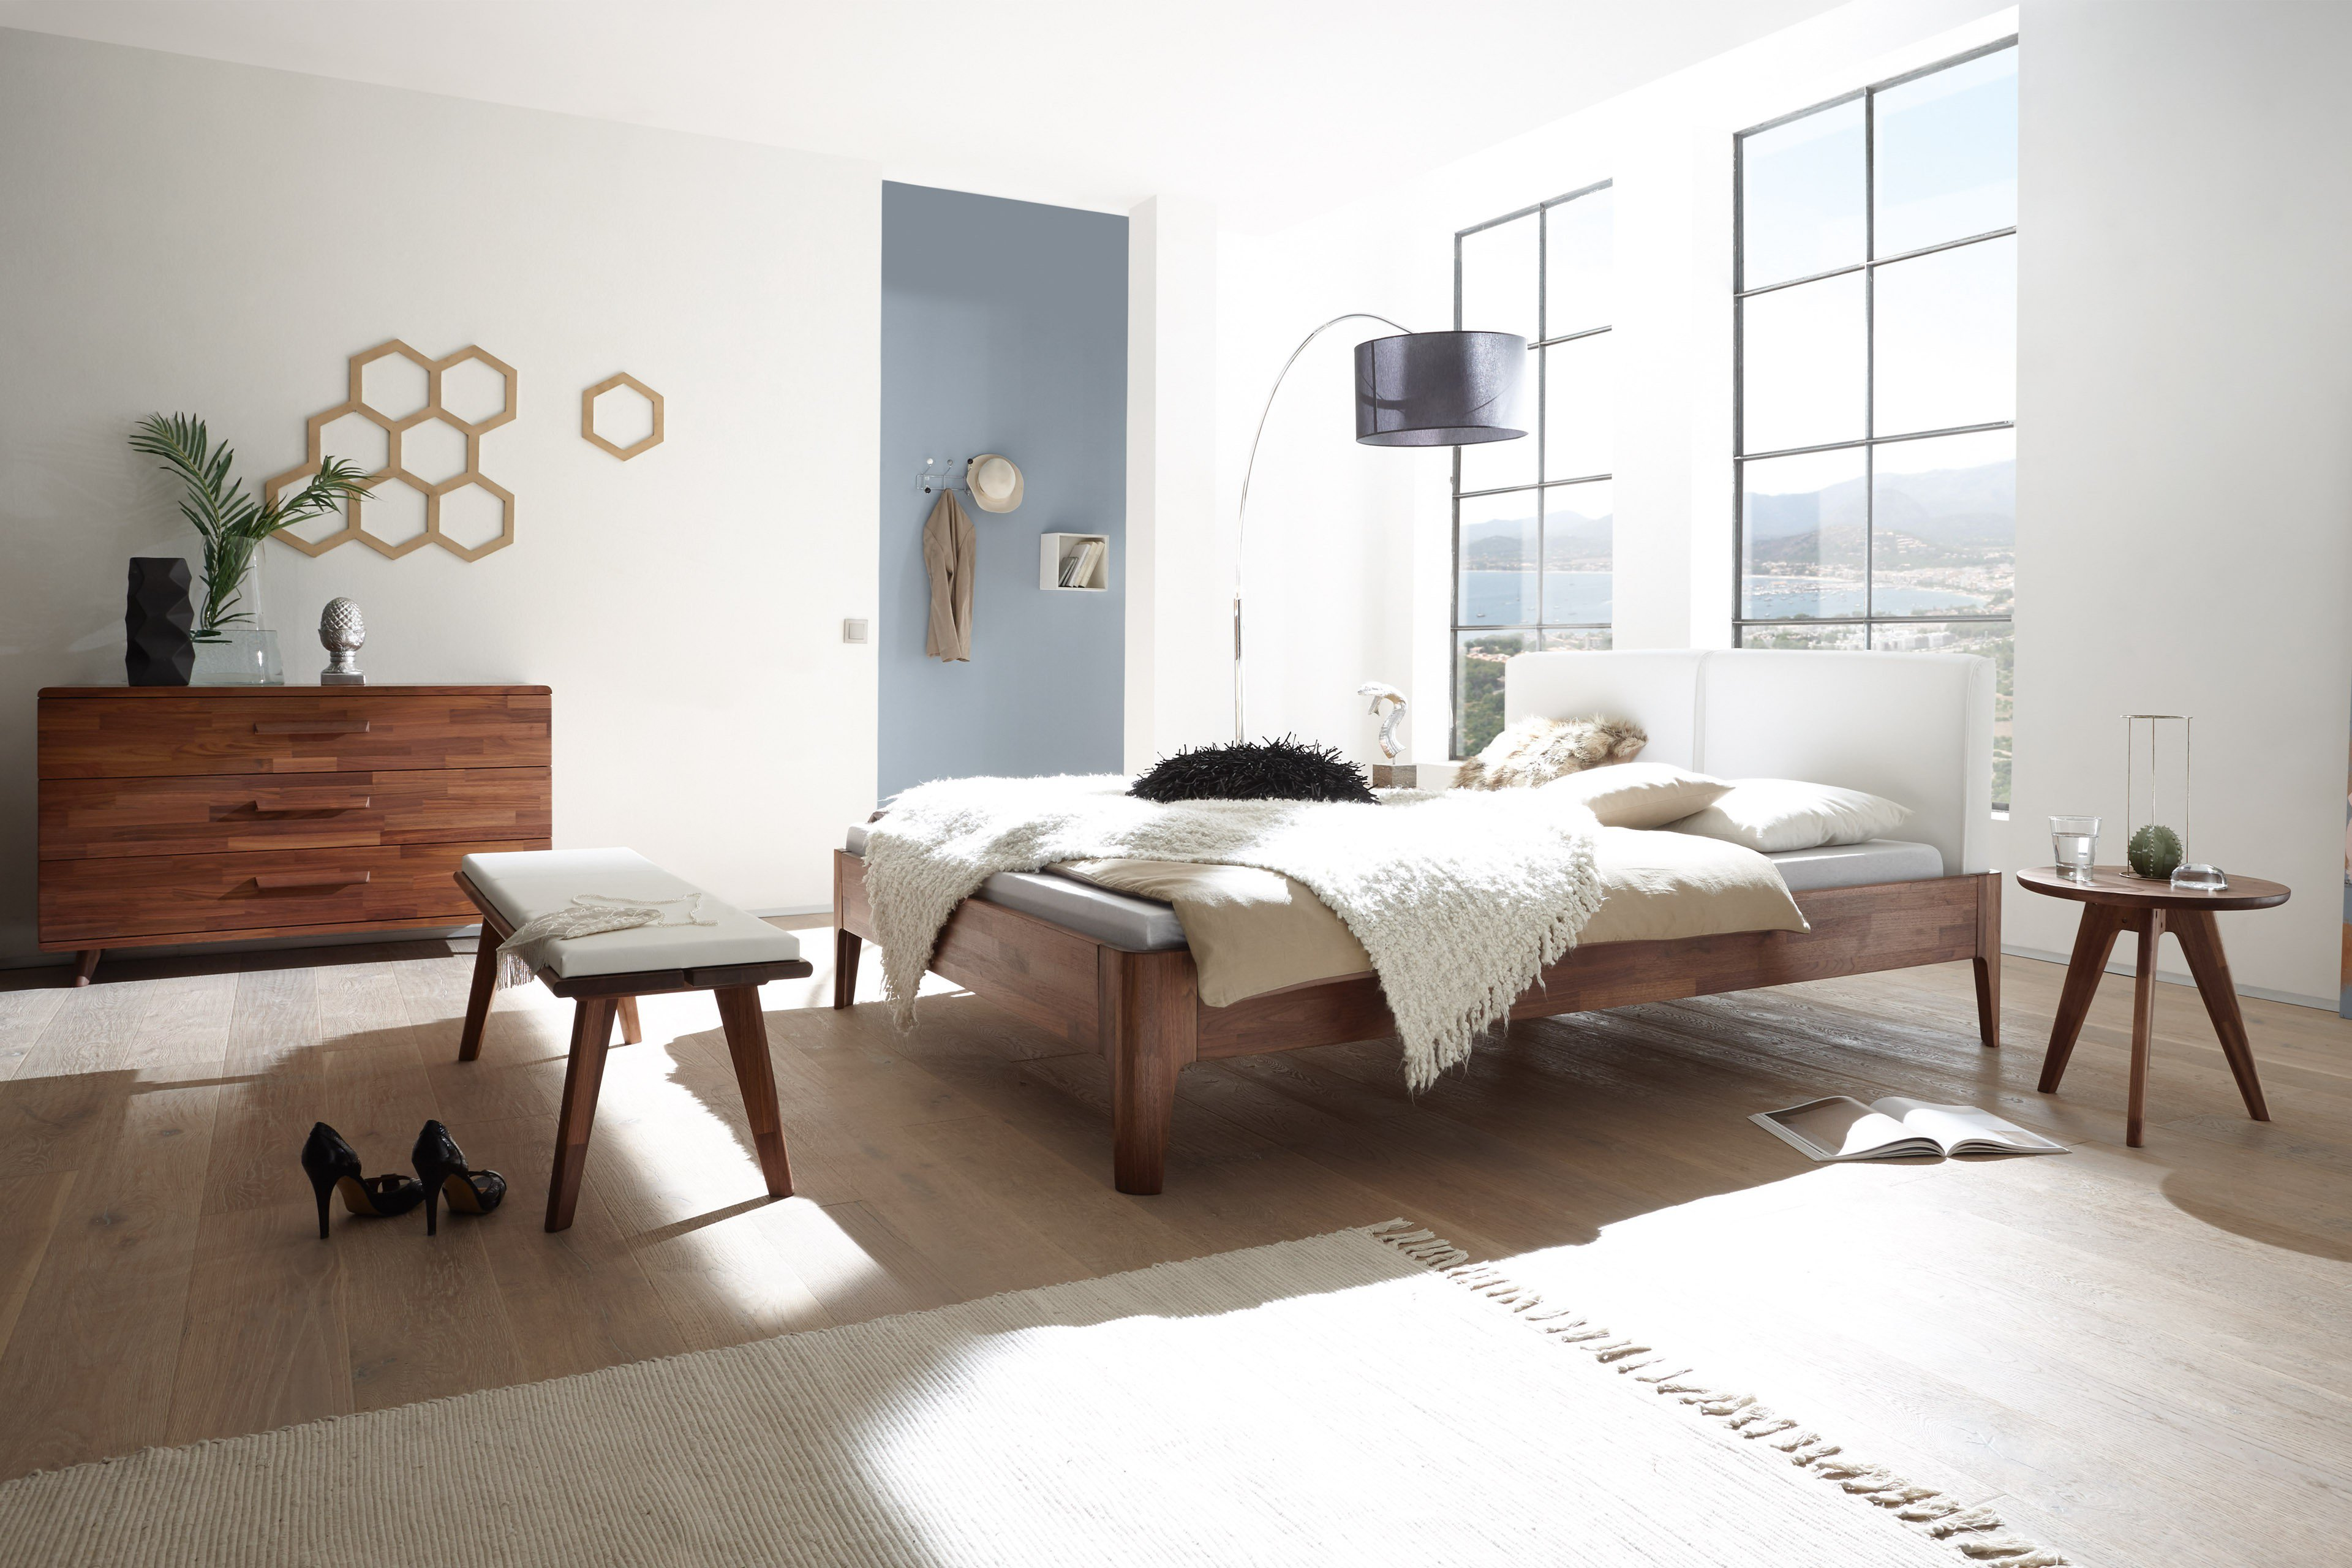 hasena fine line holz bett xylo nussbaum m bel letz. Black Bedroom Furniture Sets. Home Design Ideas